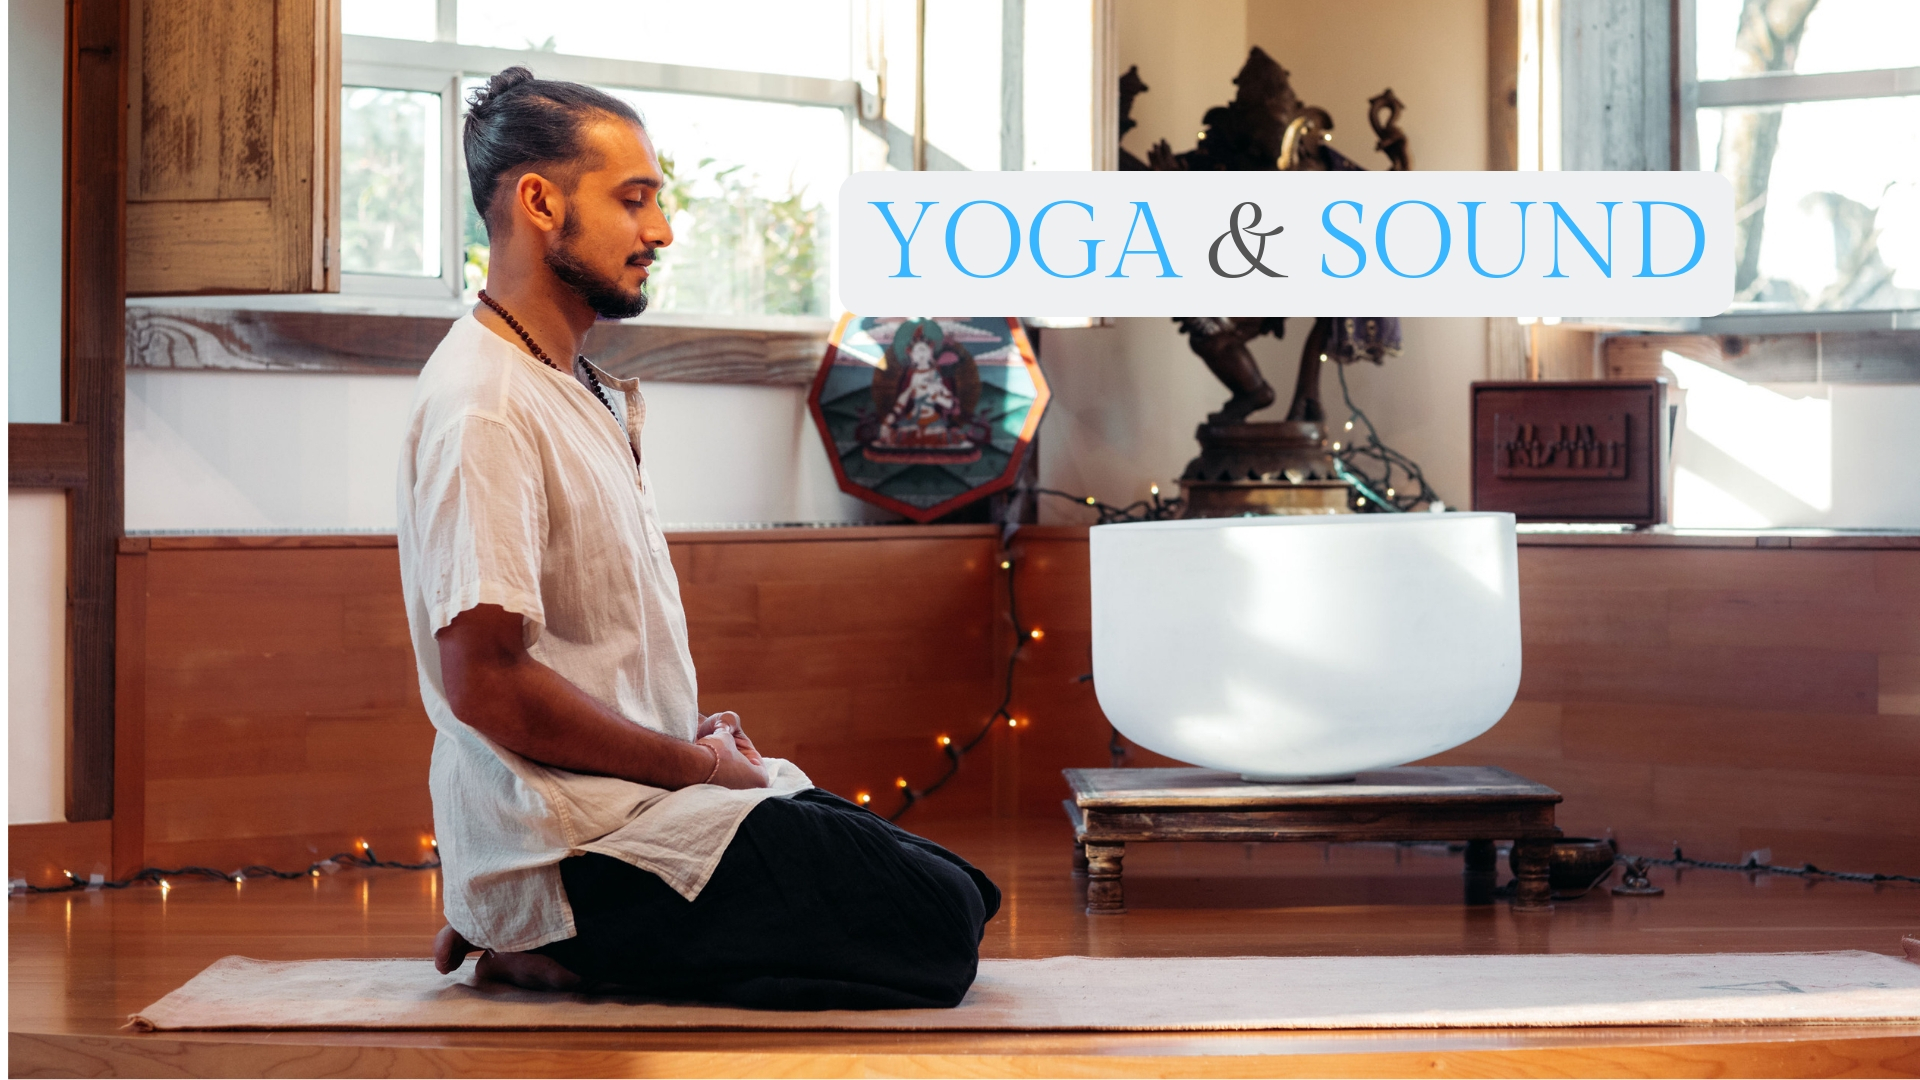 Yoga & Sound.jpg